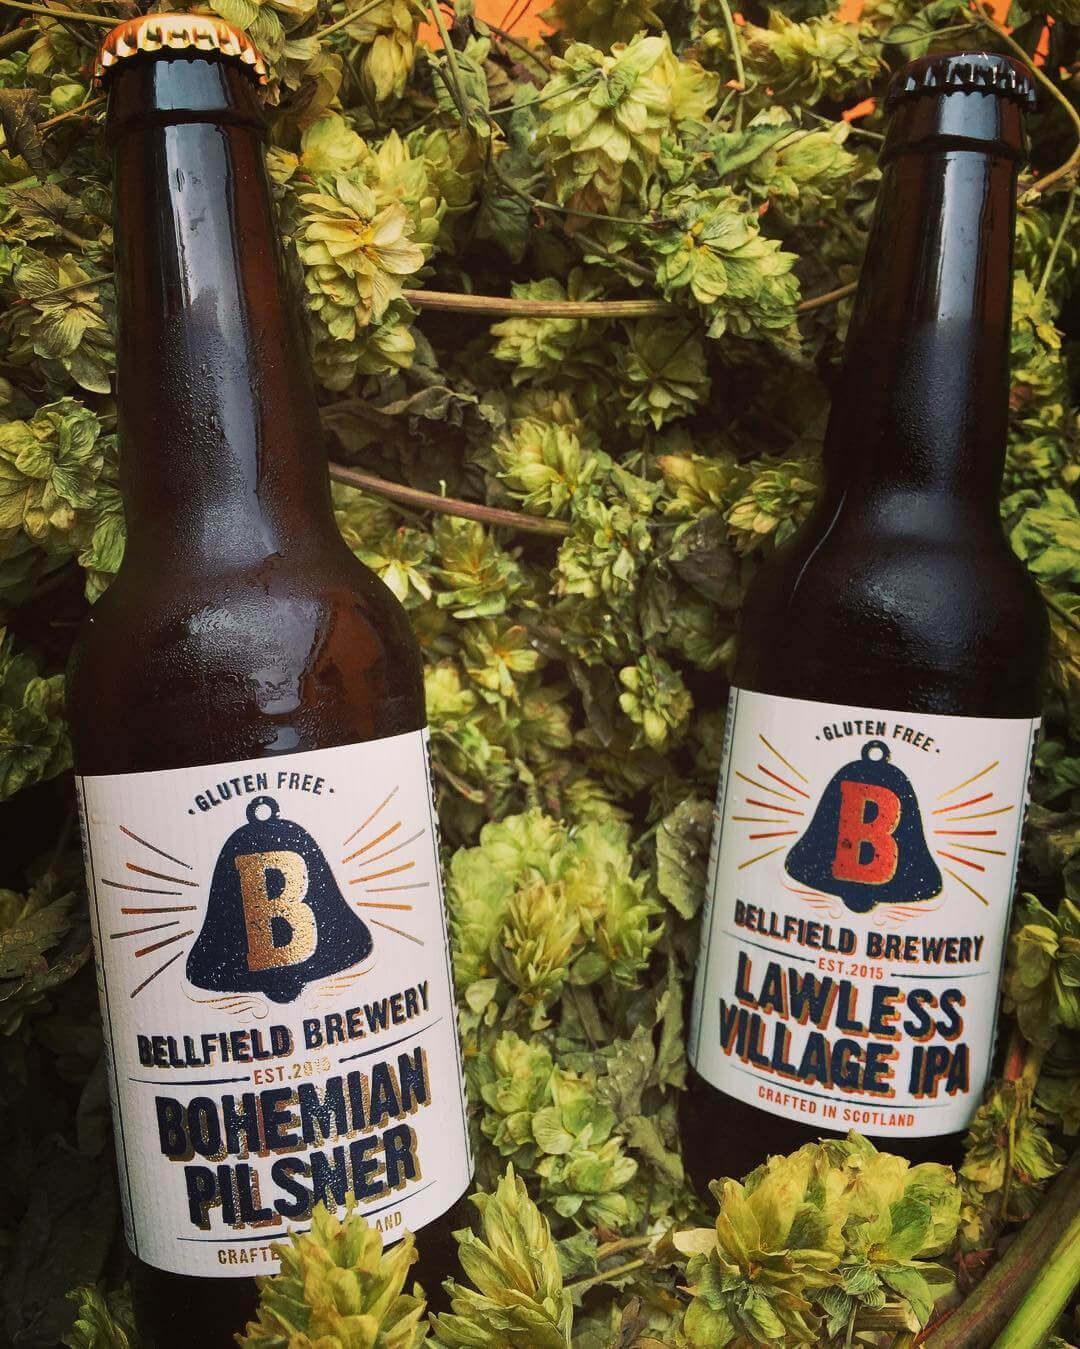 Birrificio Bellfield Brewery